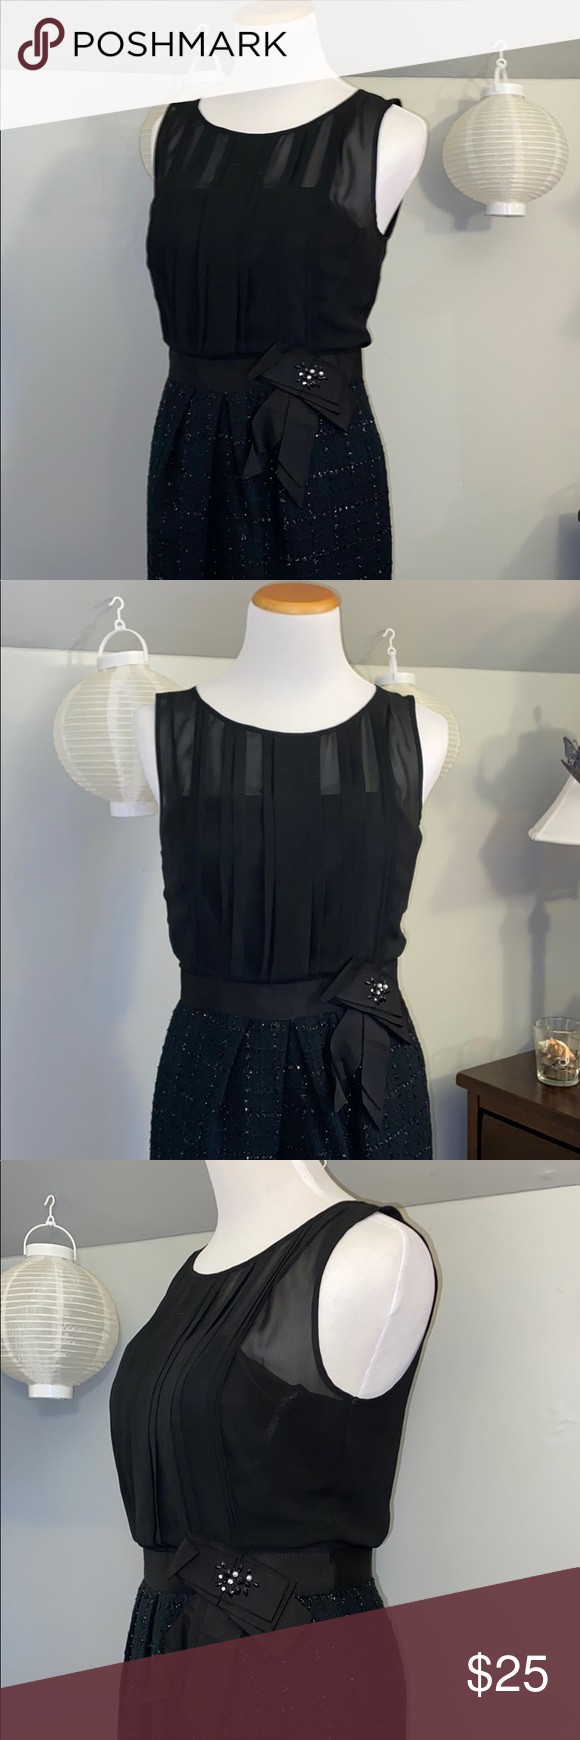 Cocktail Dress Classic Black Dress Dresses Cocktail Dress [ 1740 x 580 Pixel ]